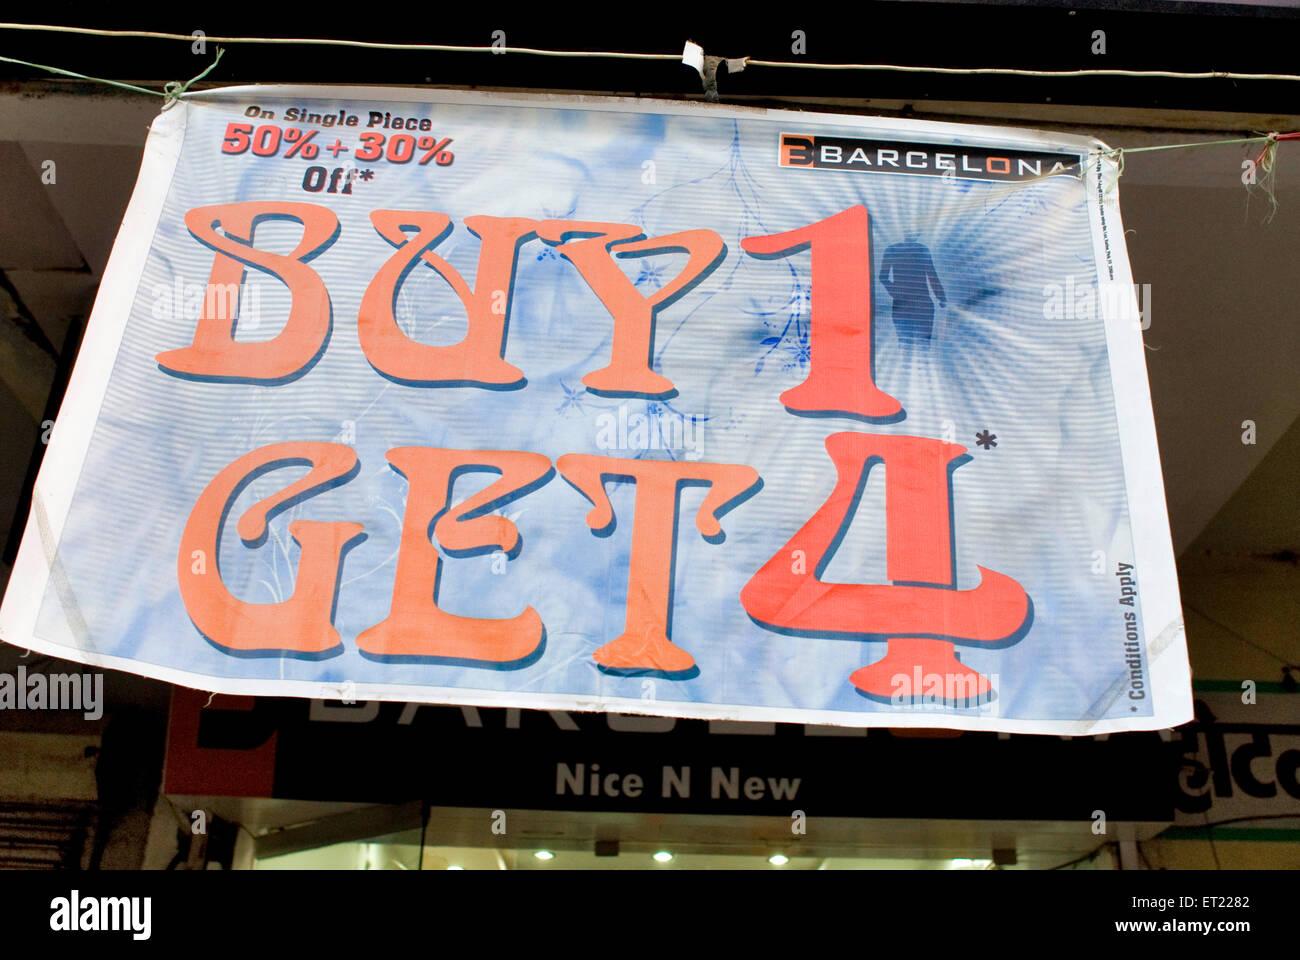 Buy one get four banner hanging outside store Part of Diwali celebration ; Gandhidham ; Kutch ; Gujarat ; India - Stock Image